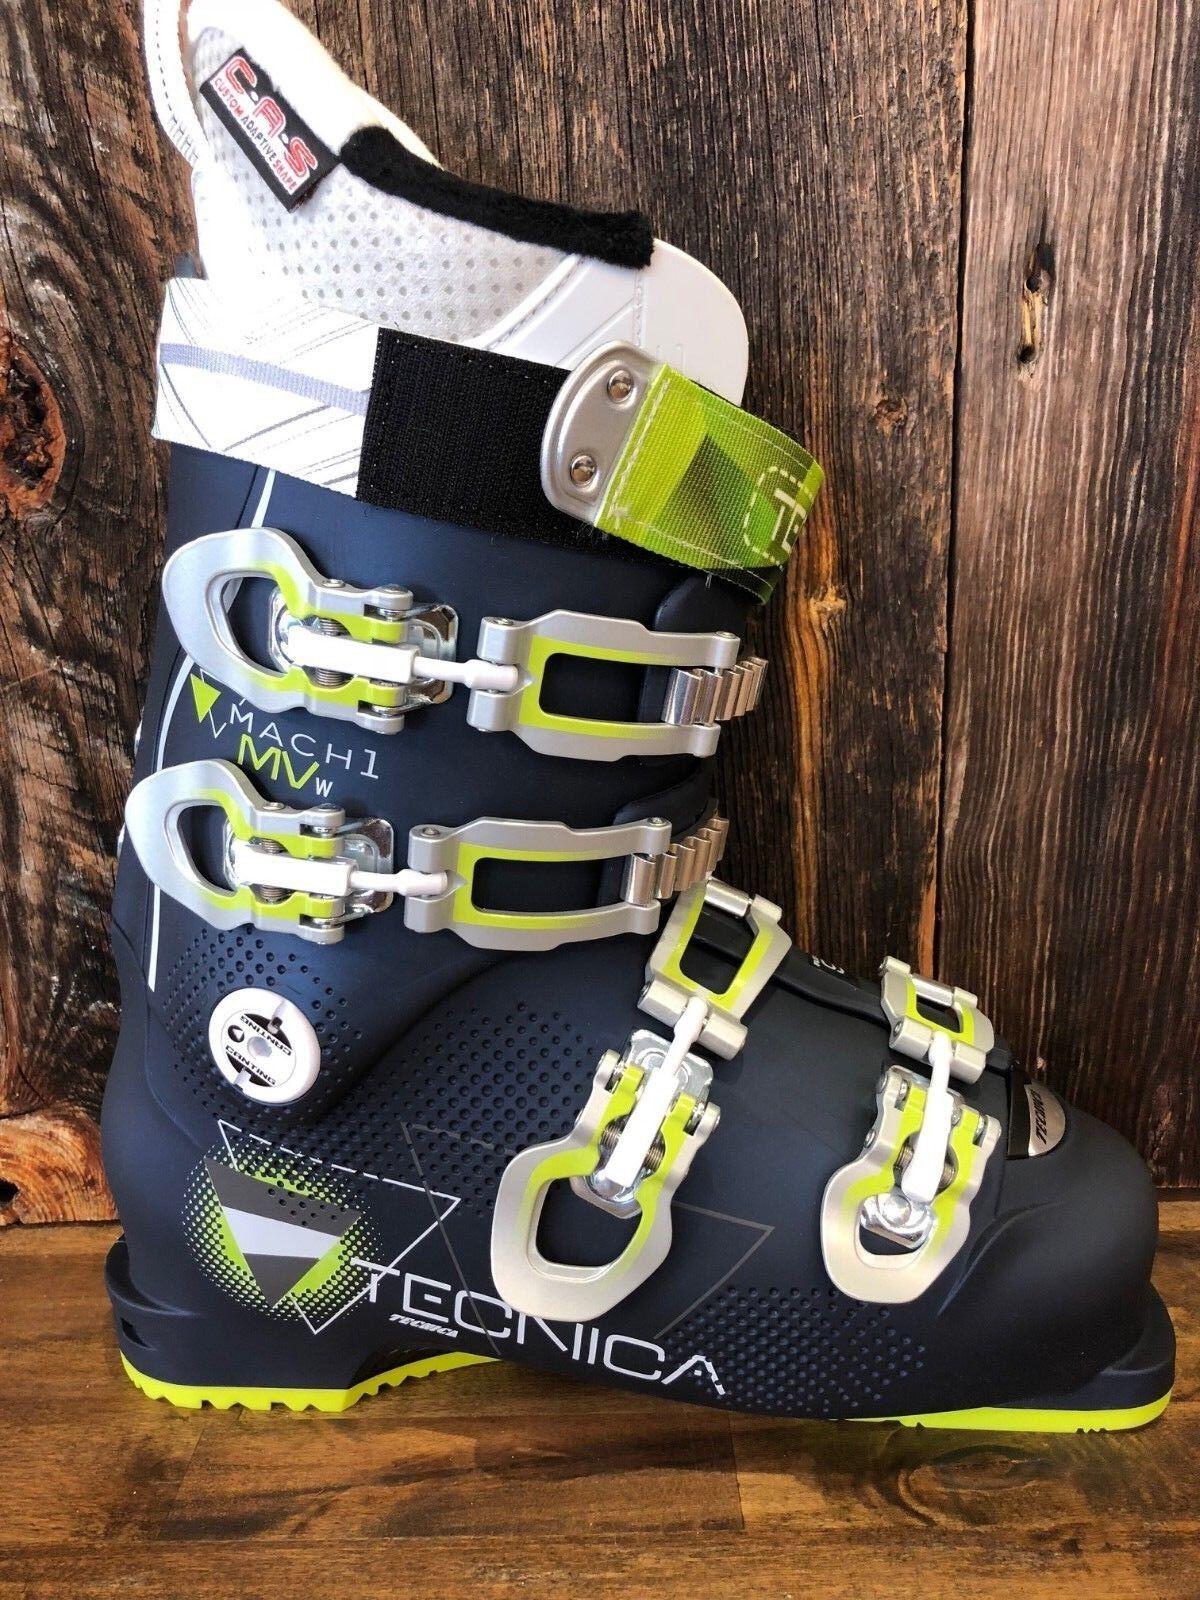 Tecnica Mach 1 95 Women's Ski Boot